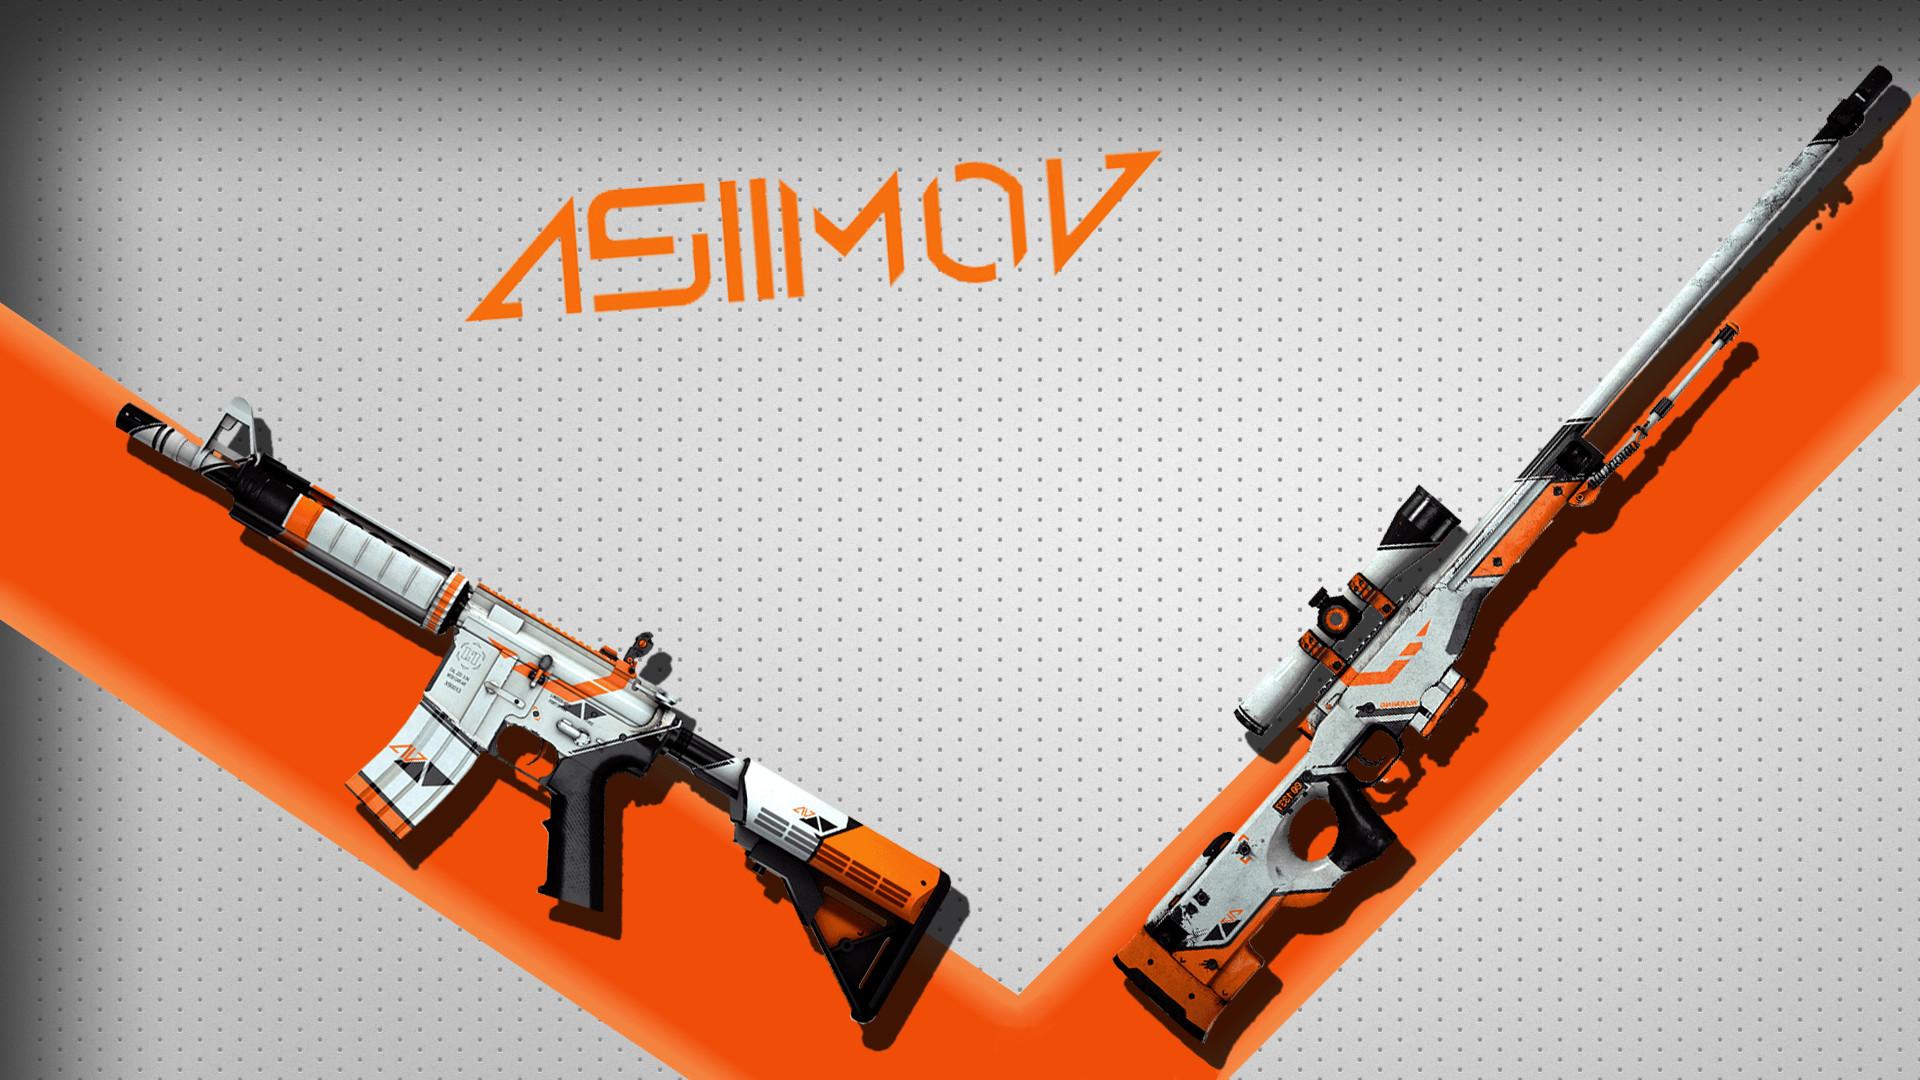 asiimov wallpaper 8